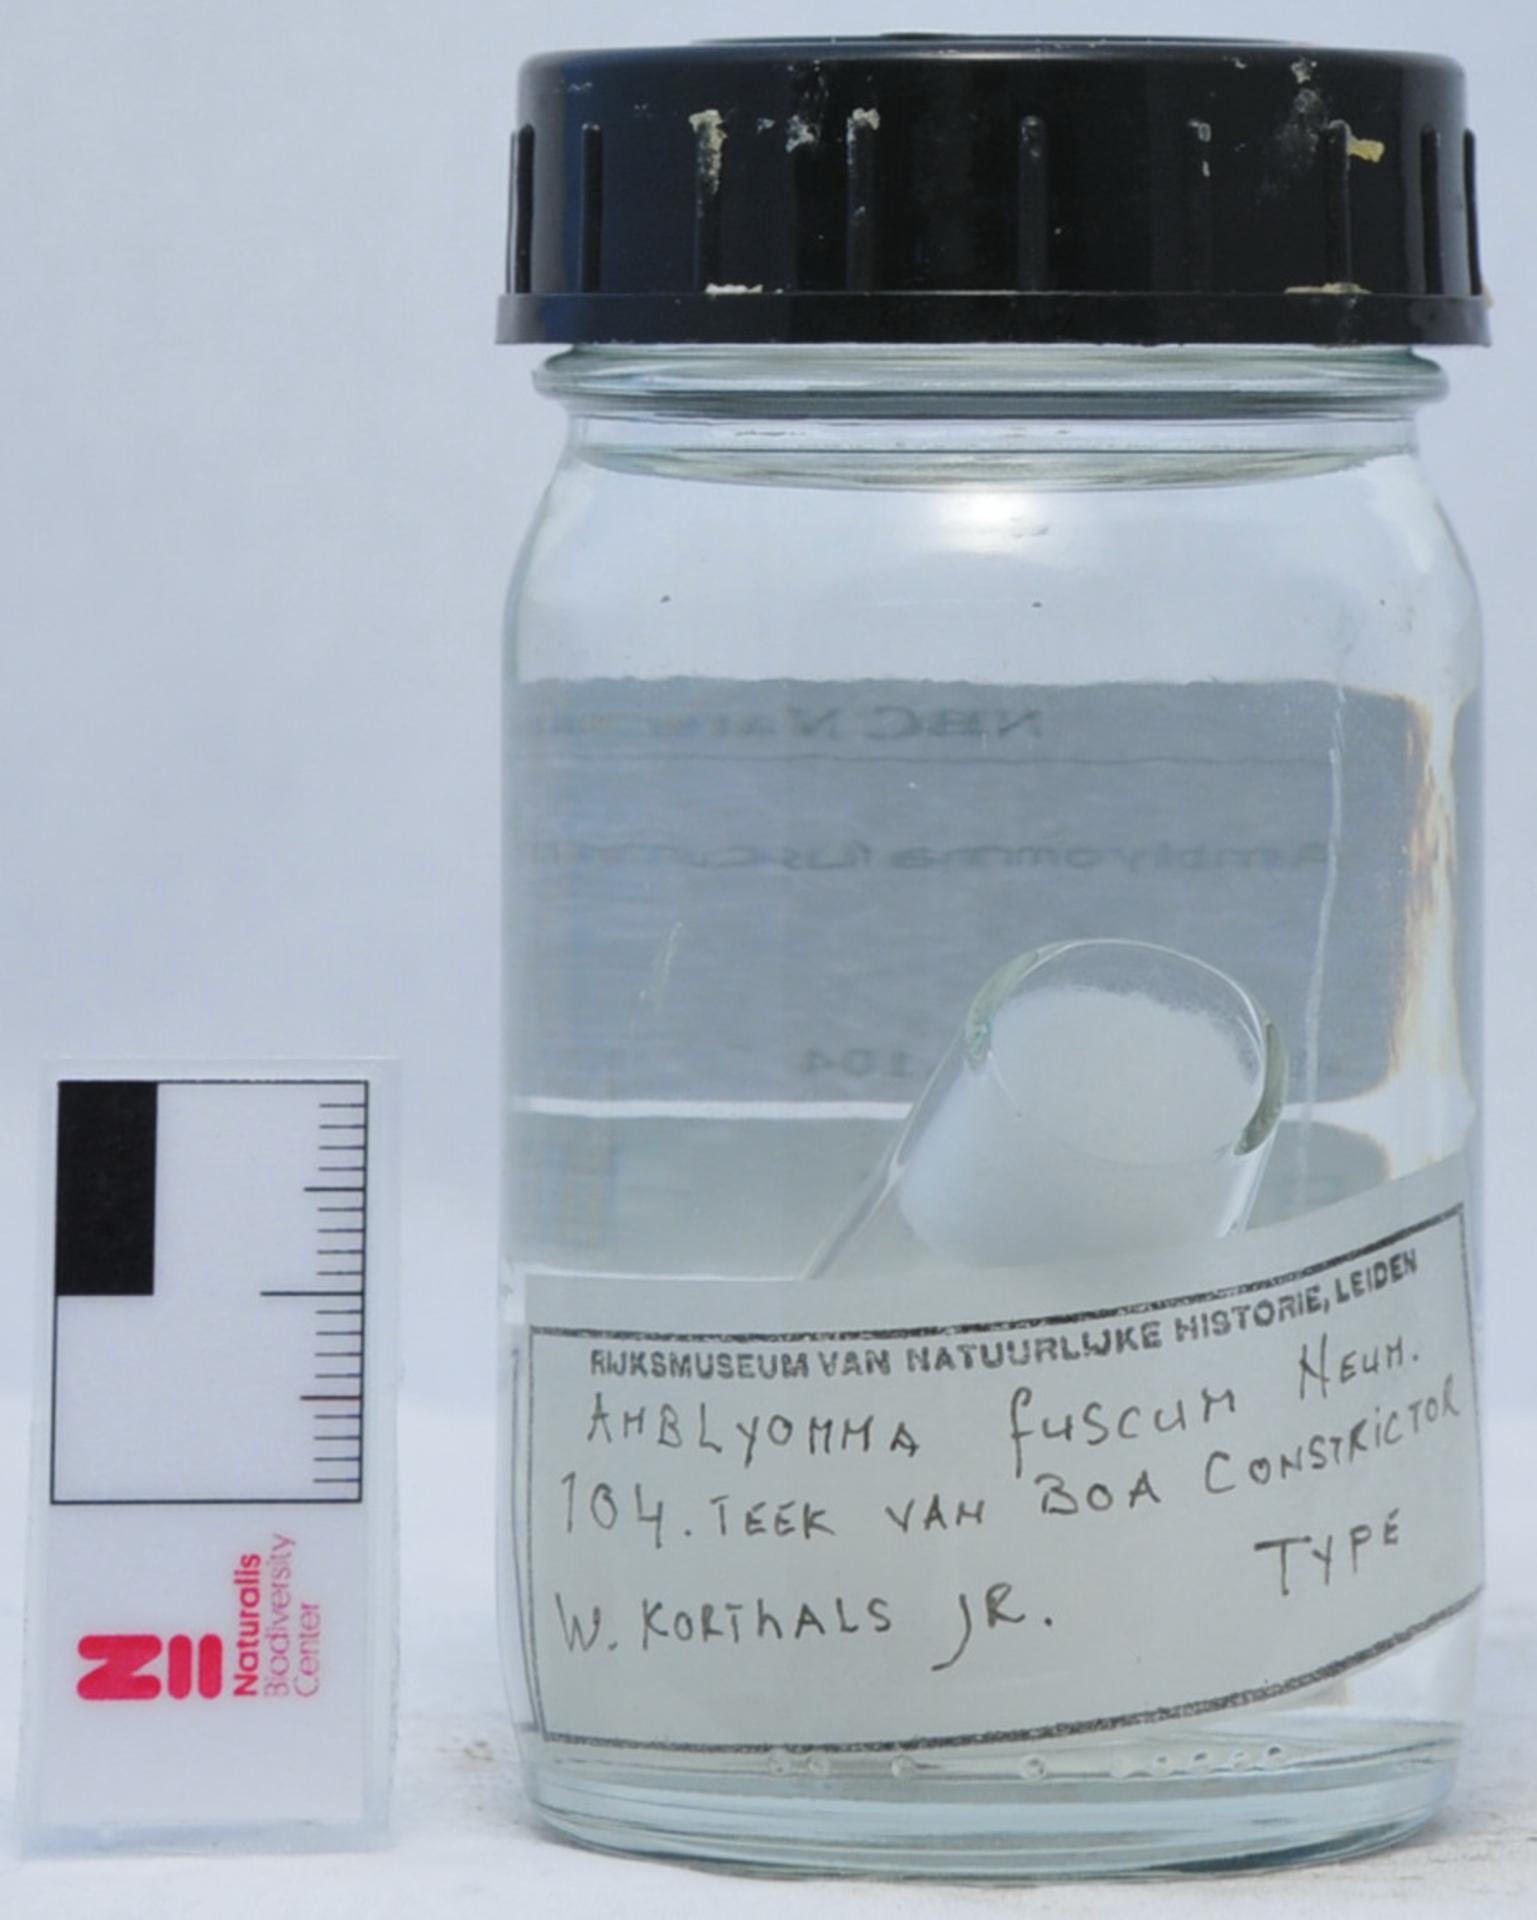 RMNH.ACA.104 | Amblyomma fuscum Neum.